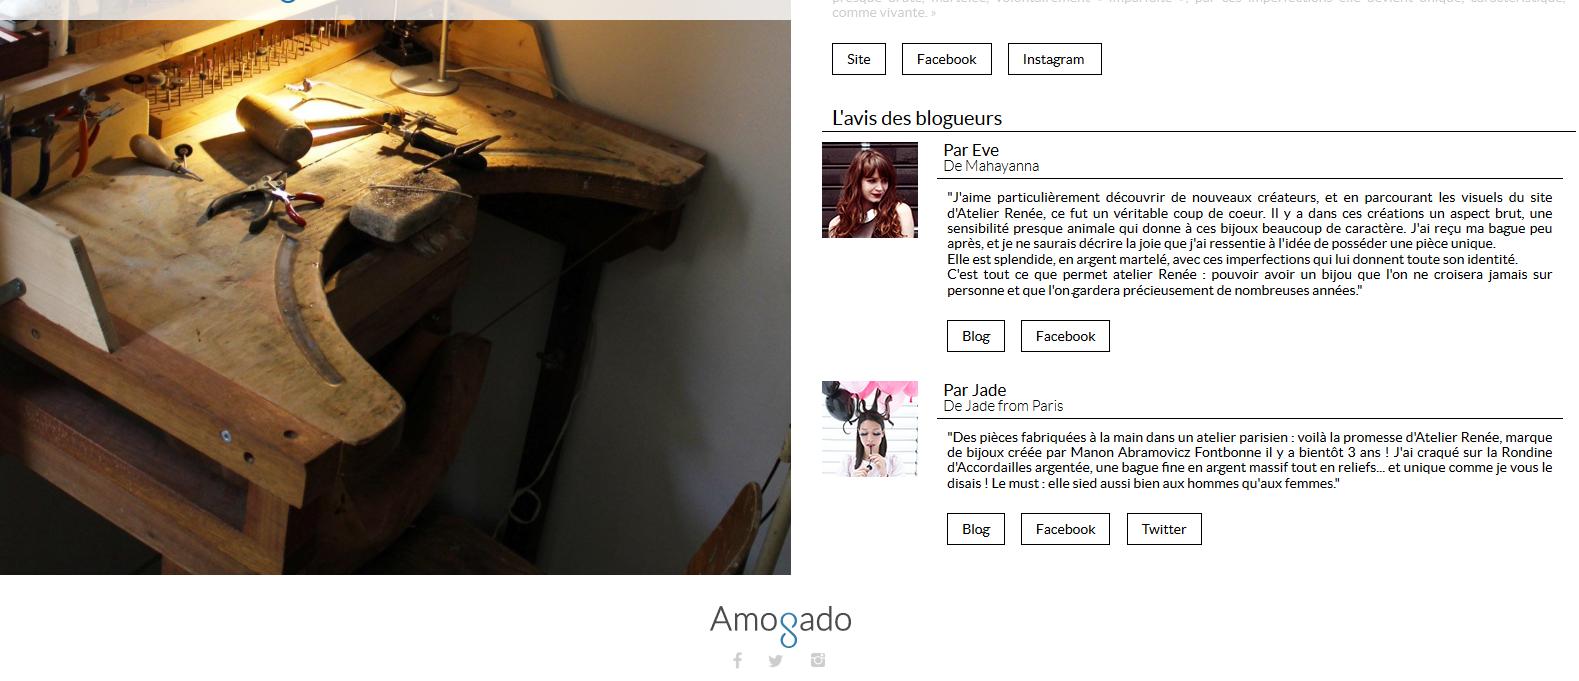 https://www.amogado.com/concours/526-atelier-renee-2-kits-bijoux.html